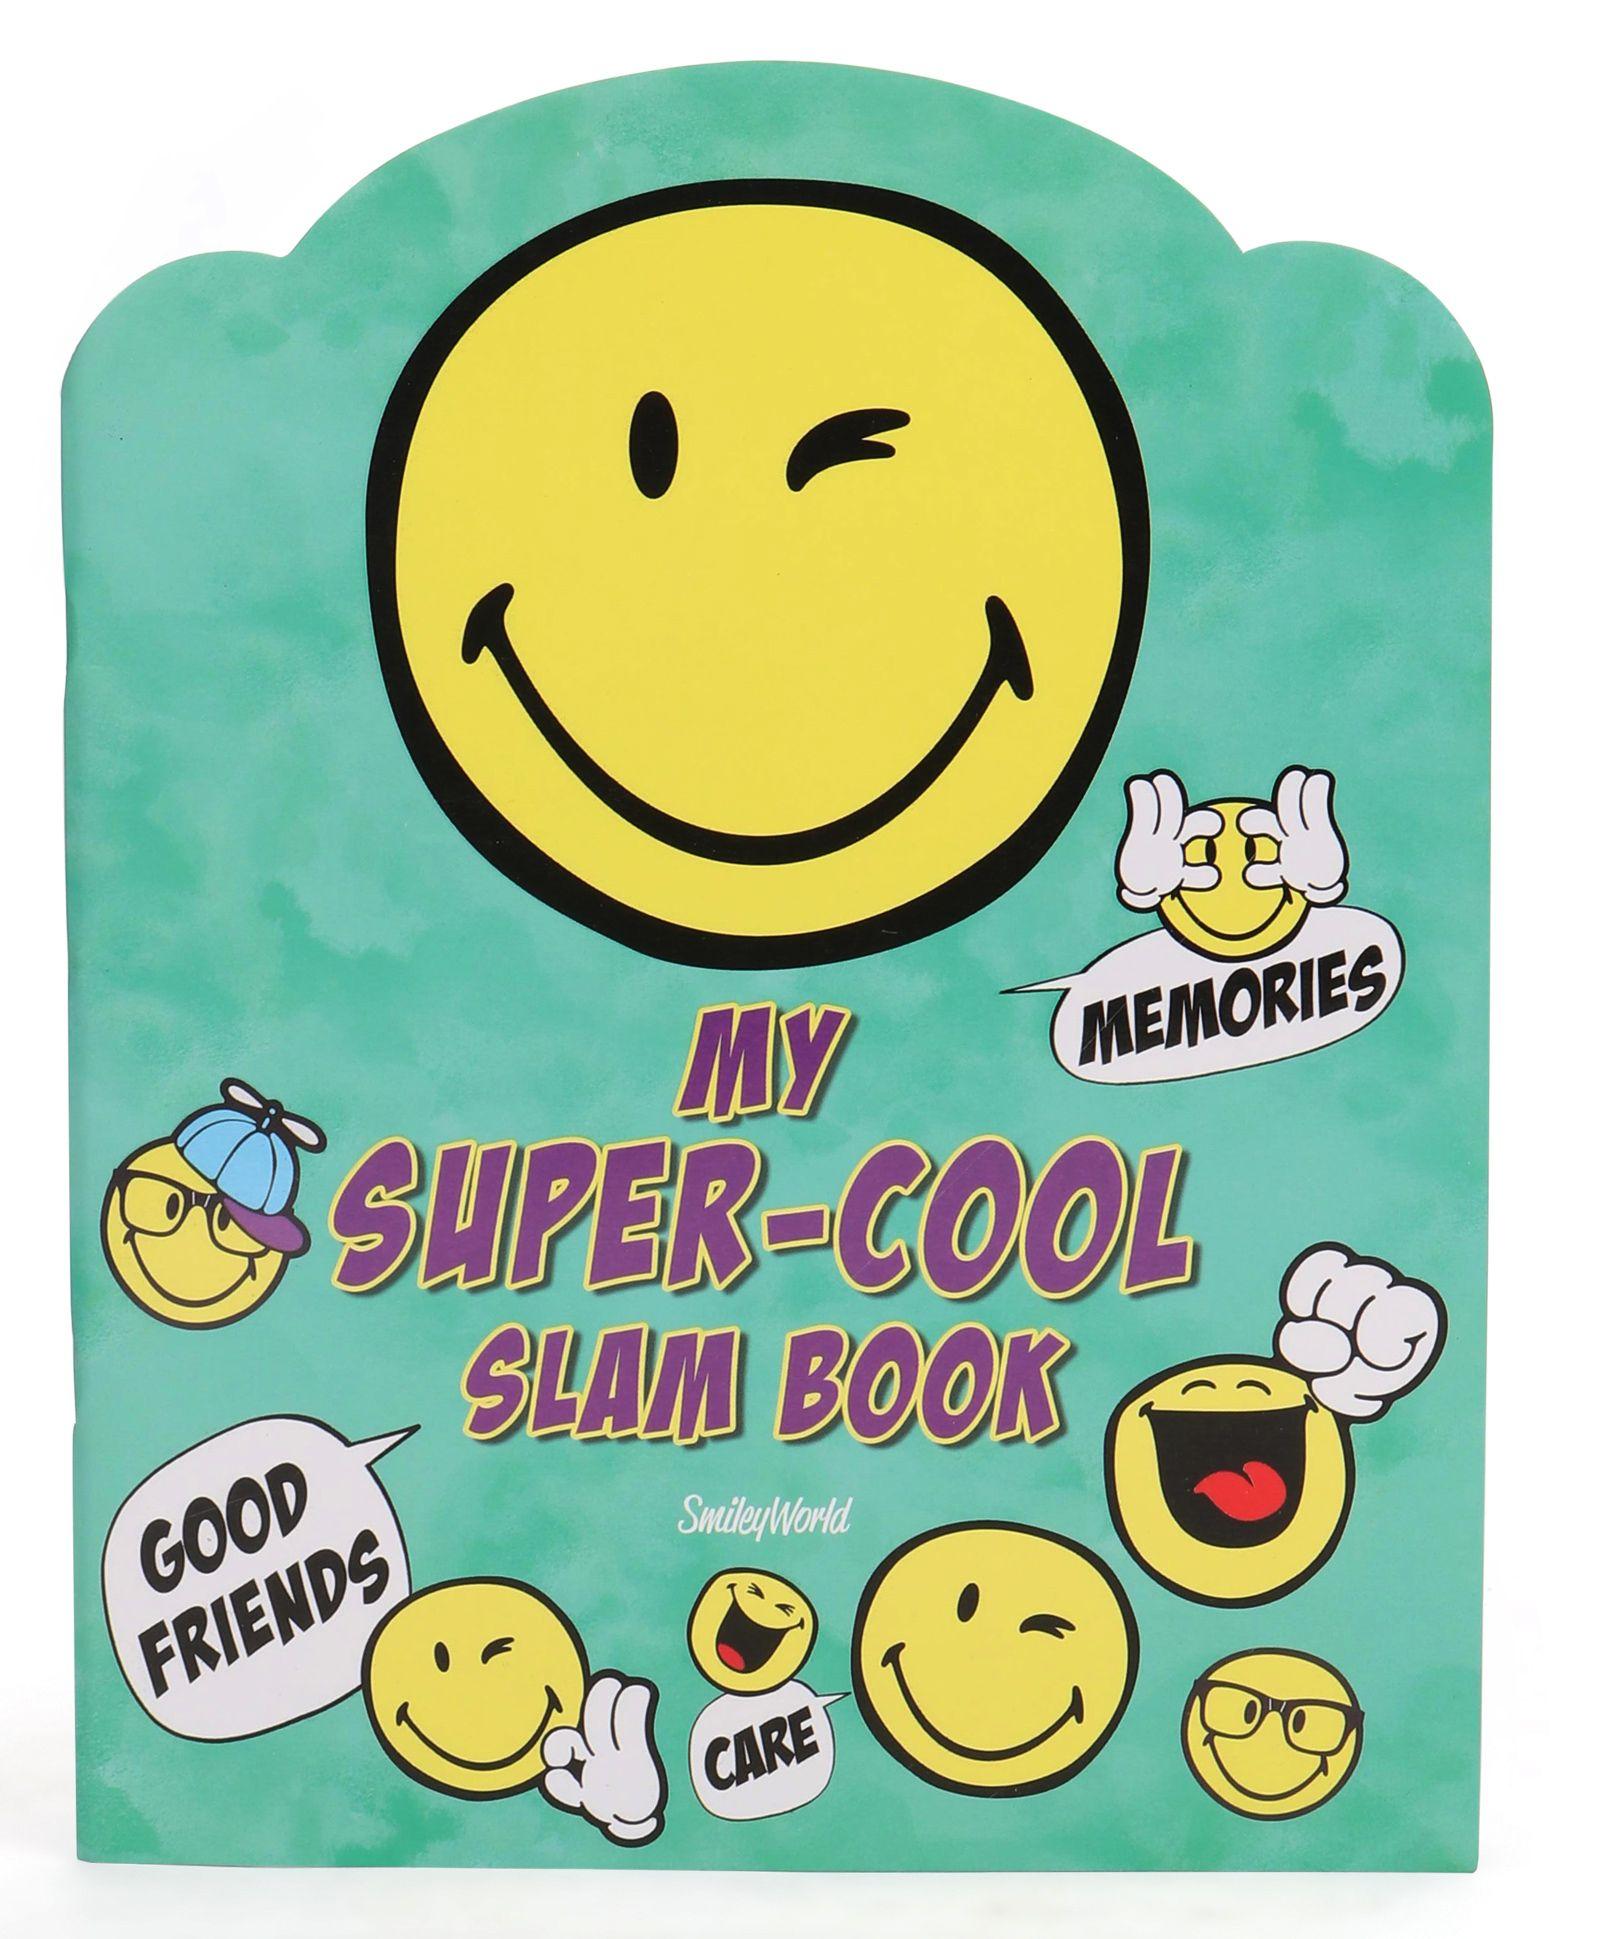 013915cd9947 Archies Slam Book Emoji Print English Online in India